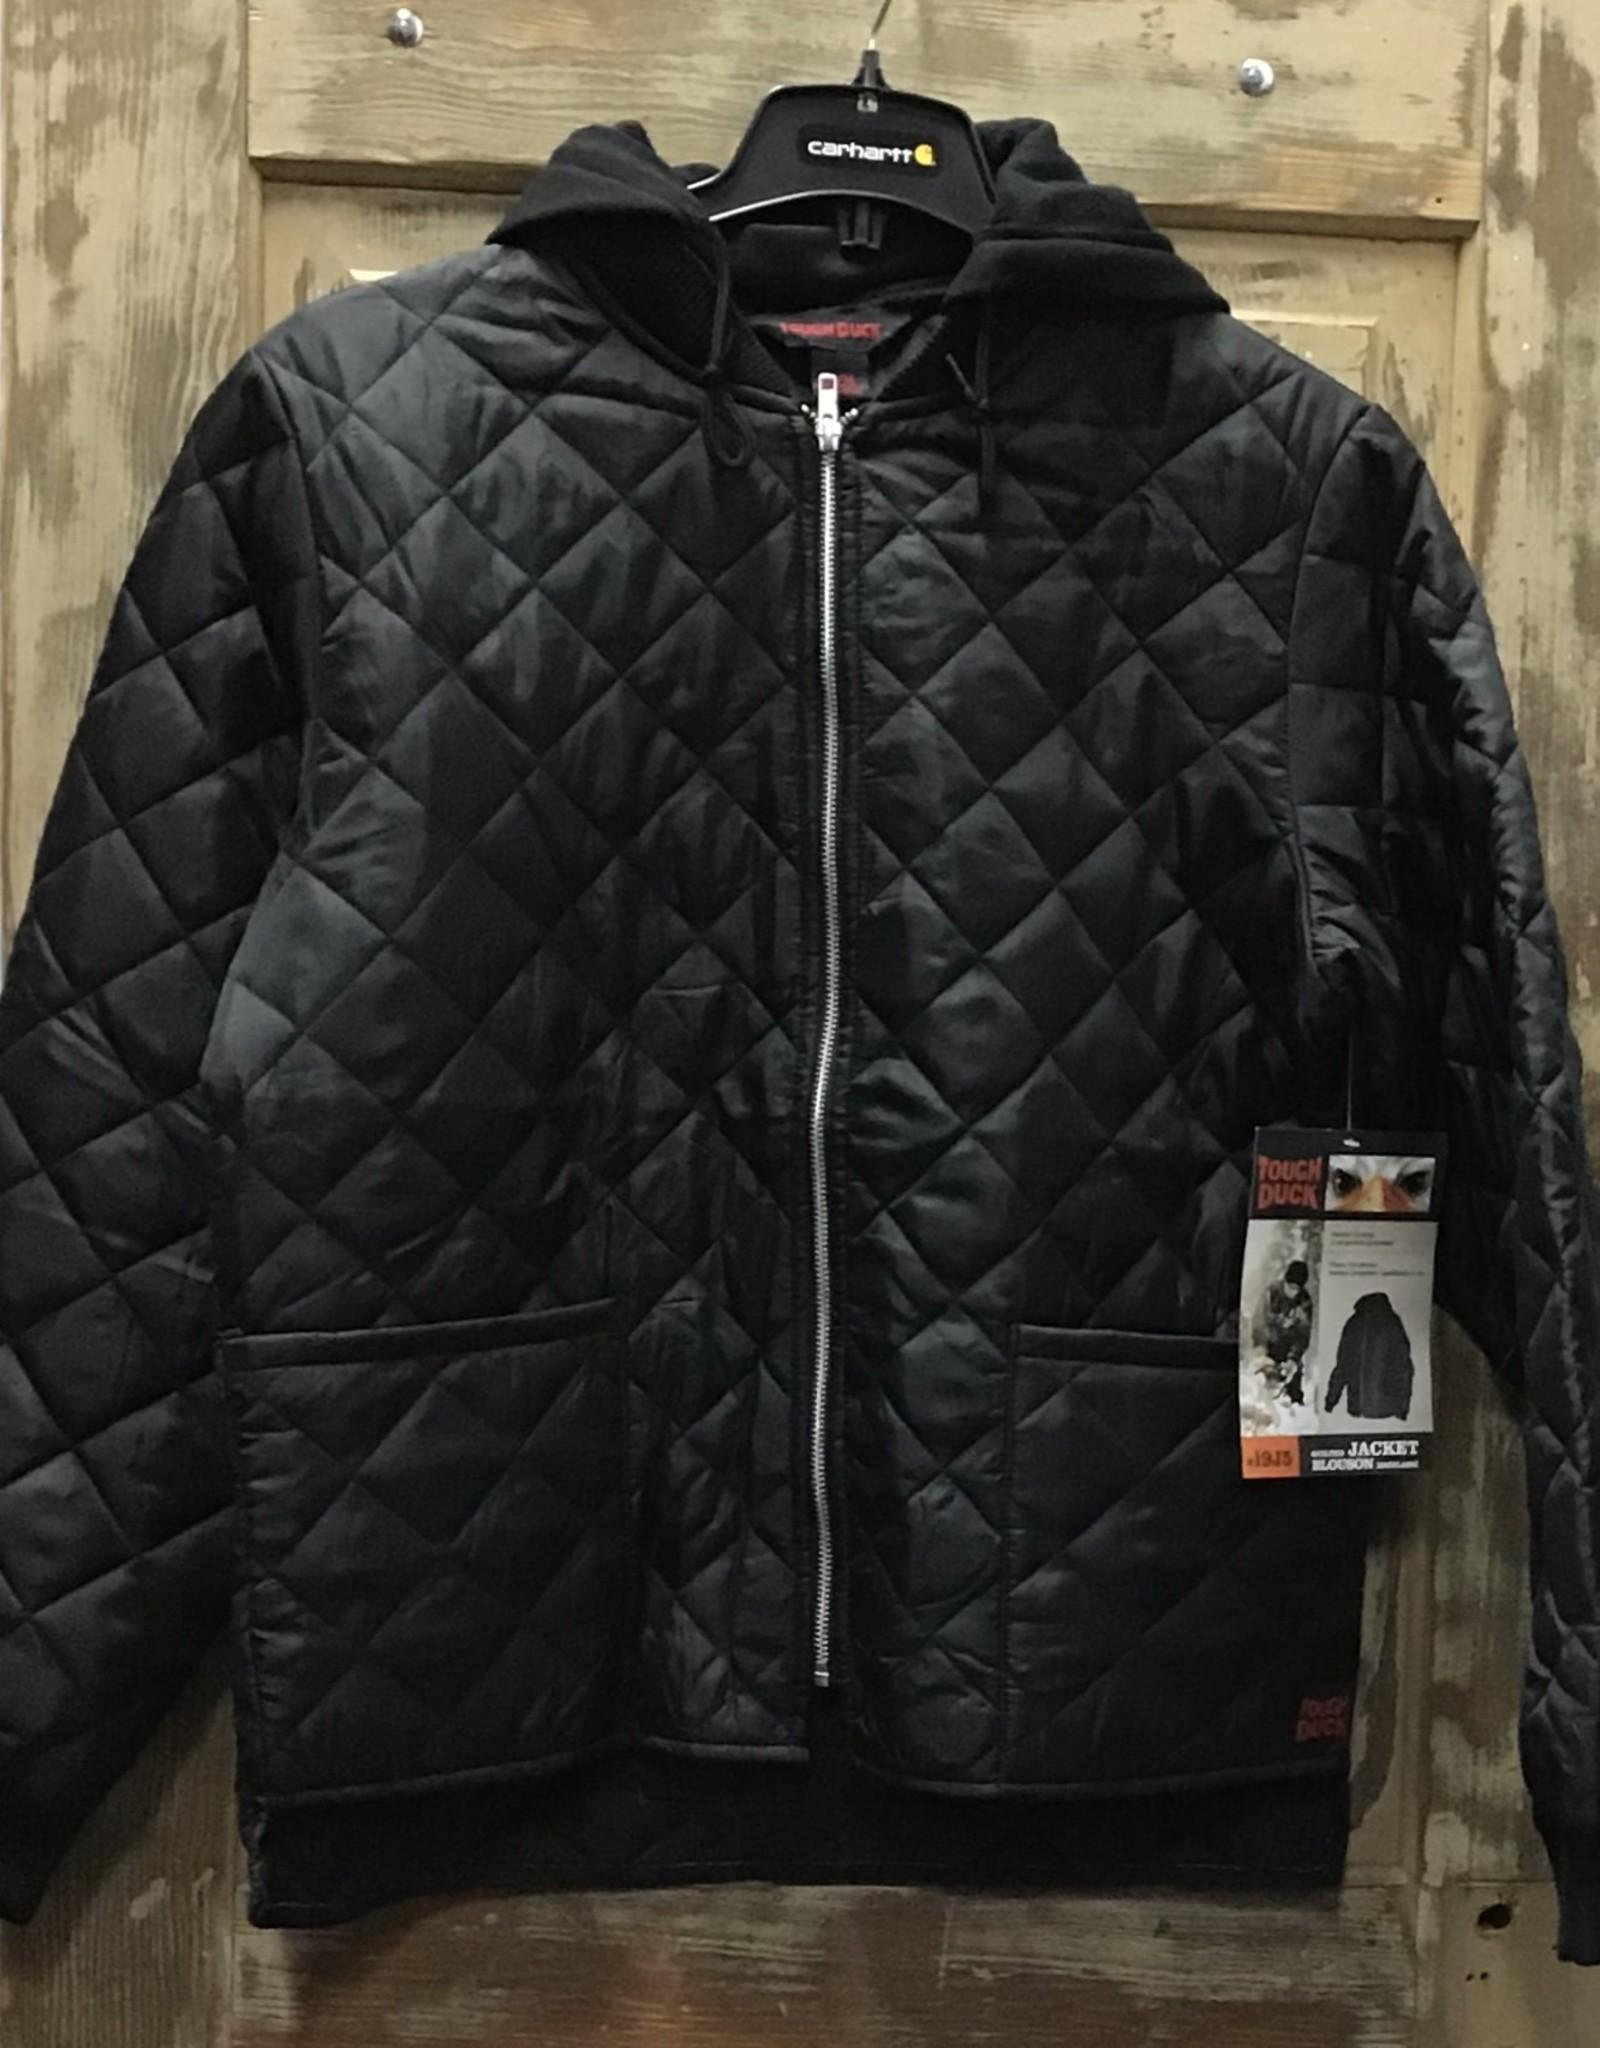 Tough Duck Tough Duck I9J5 Freezer Jacket Men's